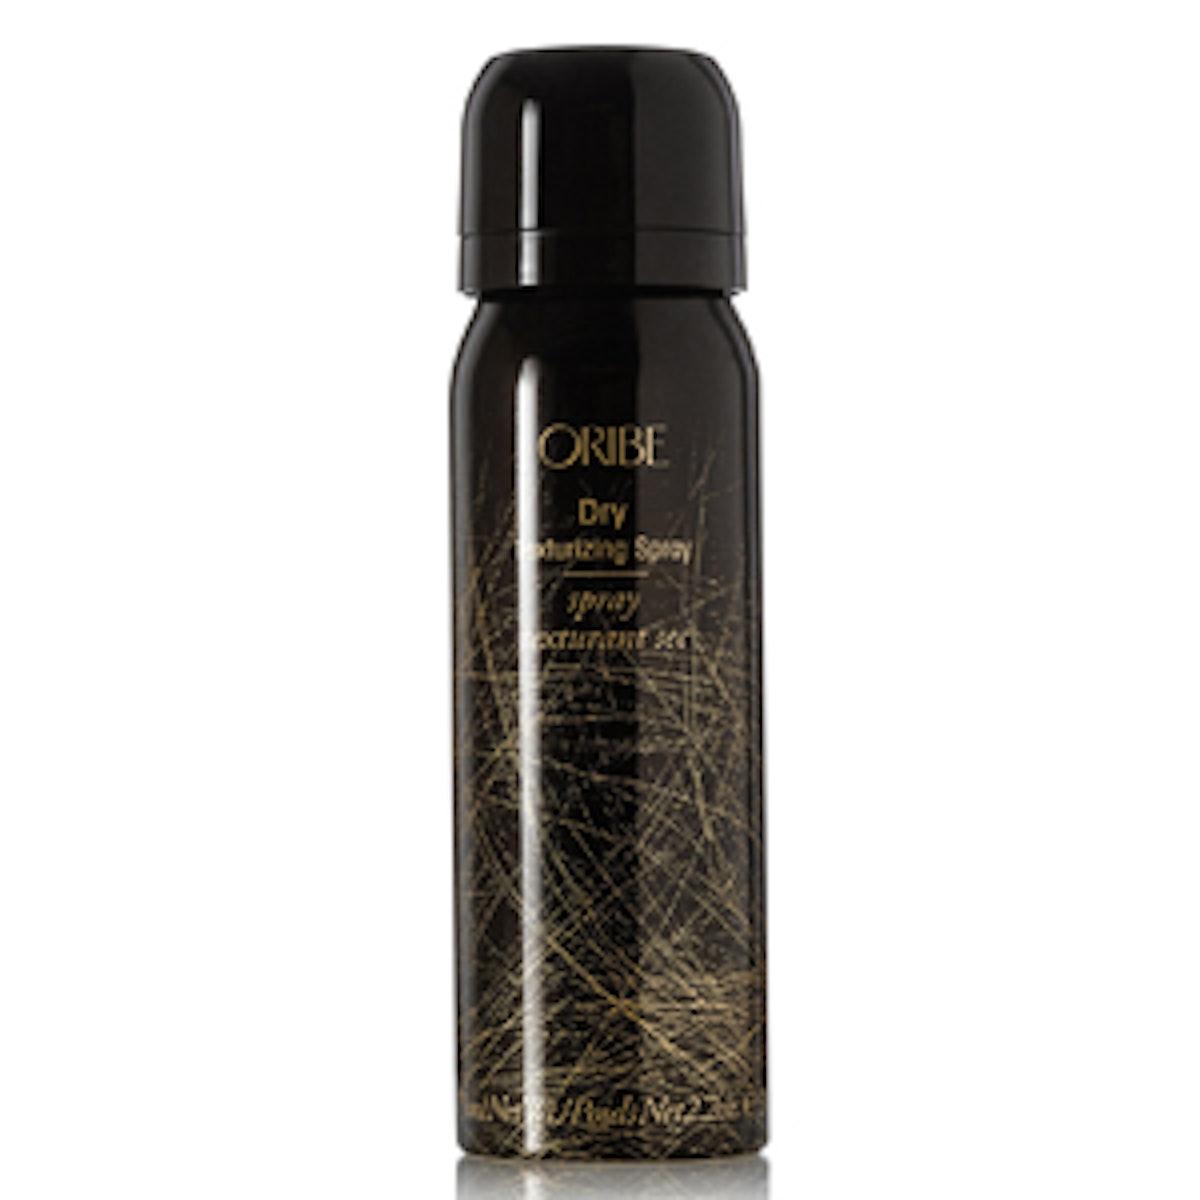 Travel-Sized Dry Texturizing Spray